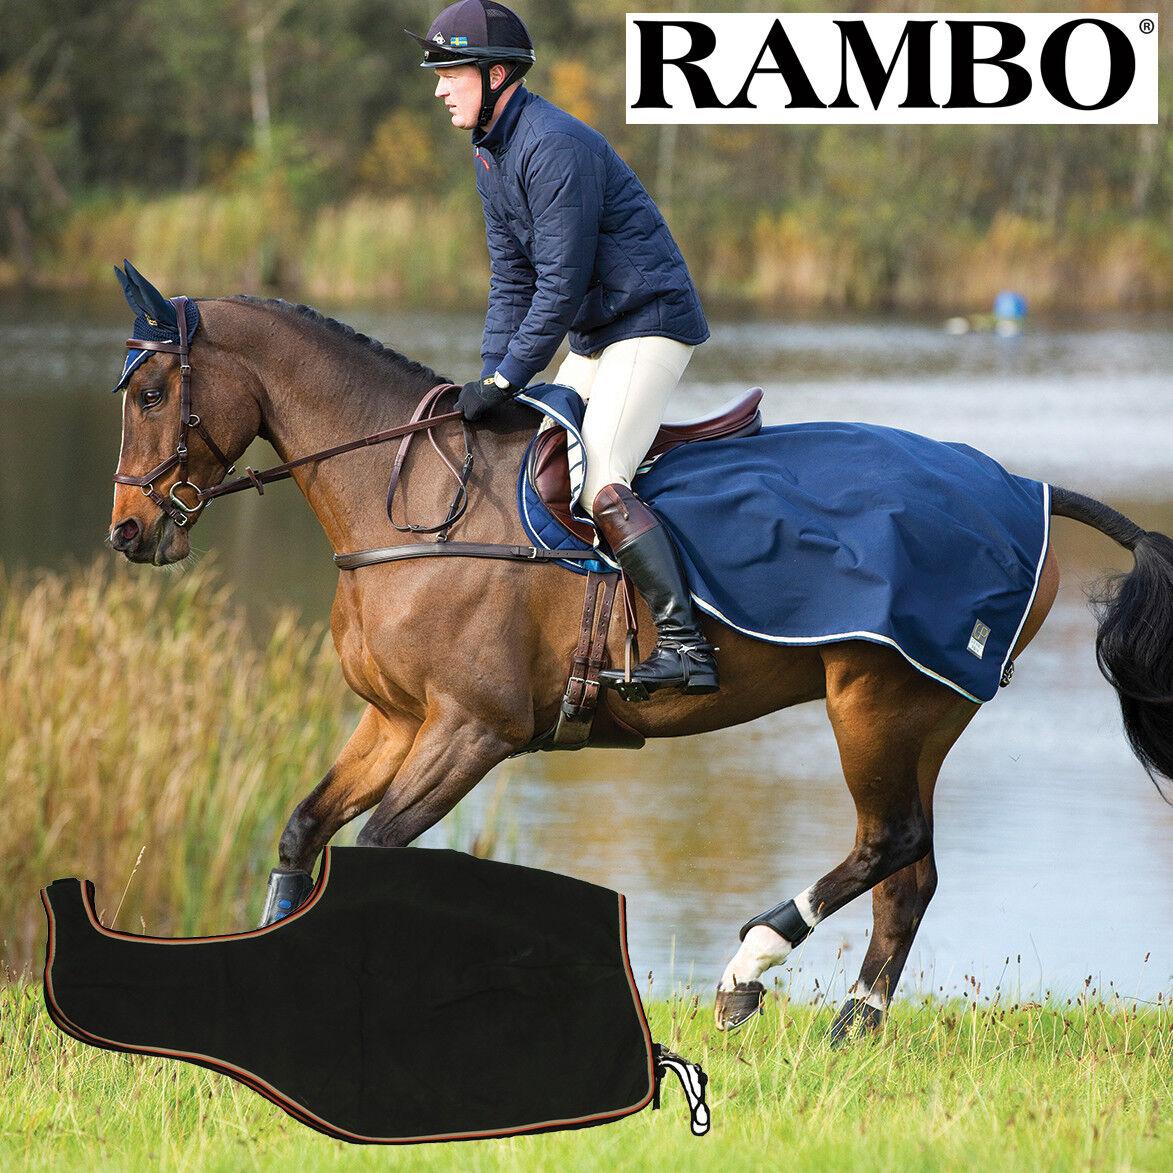 Rambo Grand Fleece Prix Waterproof Fleece Grand Competition Sheet (AGAC2G) BNWT 485a5a